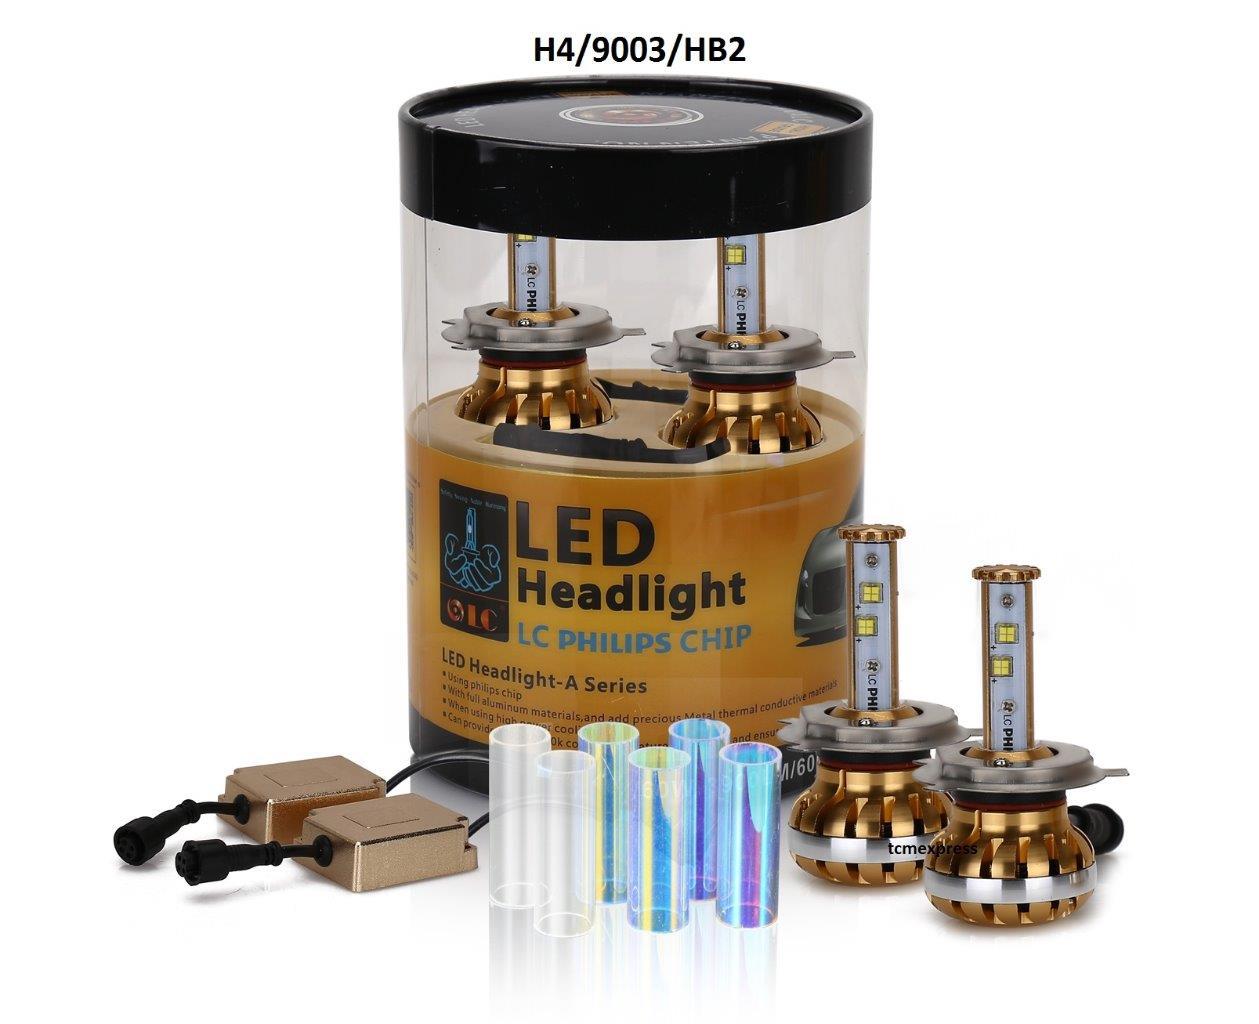 diy 3 colors philips led headlight kit bulb h4 9003 9007. Black Bedroom Furniture Sets. Home Design Ideas